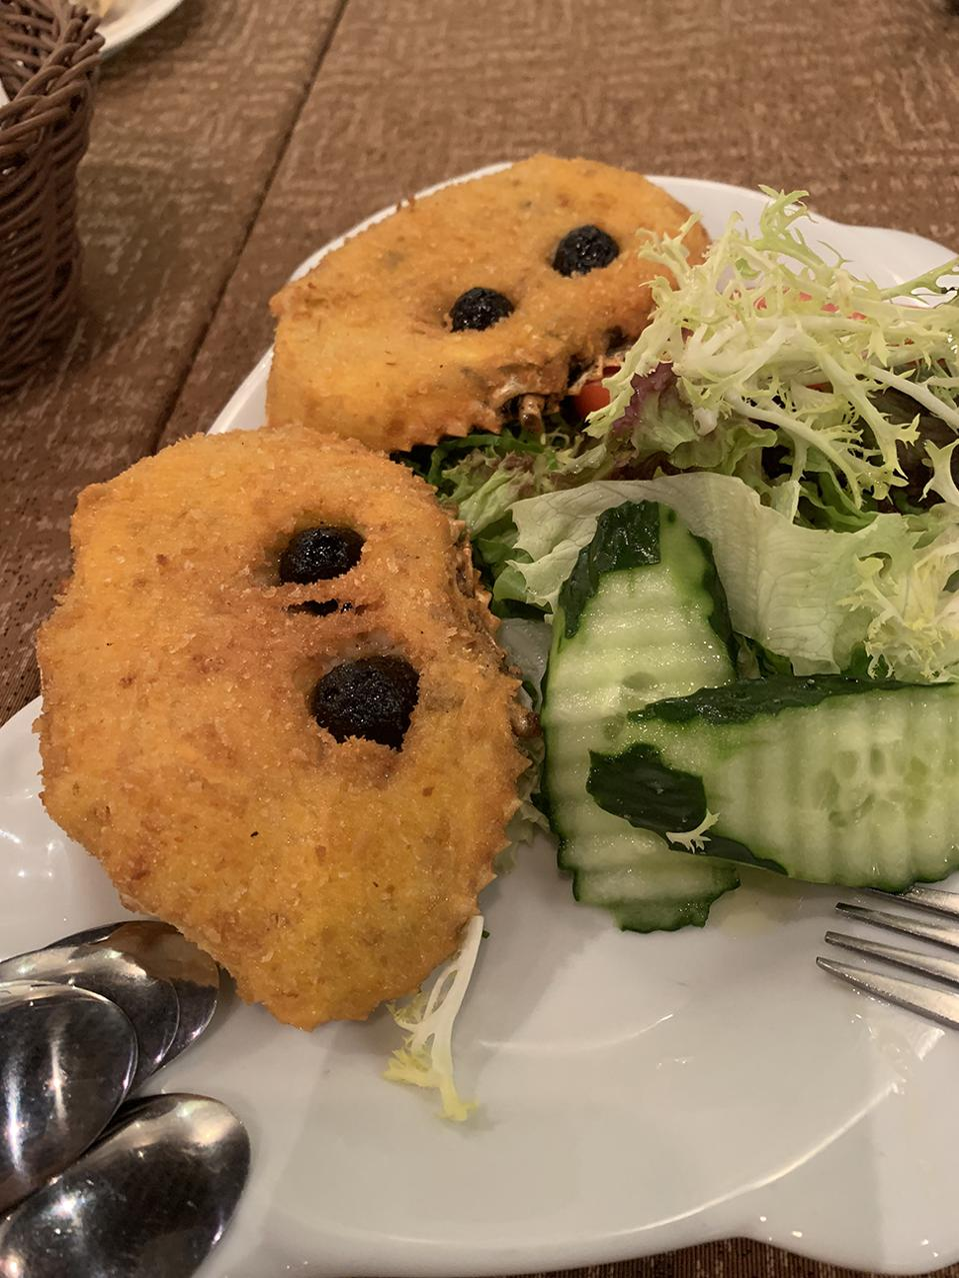 Restaurante Litoral Taipa's Baked Crab